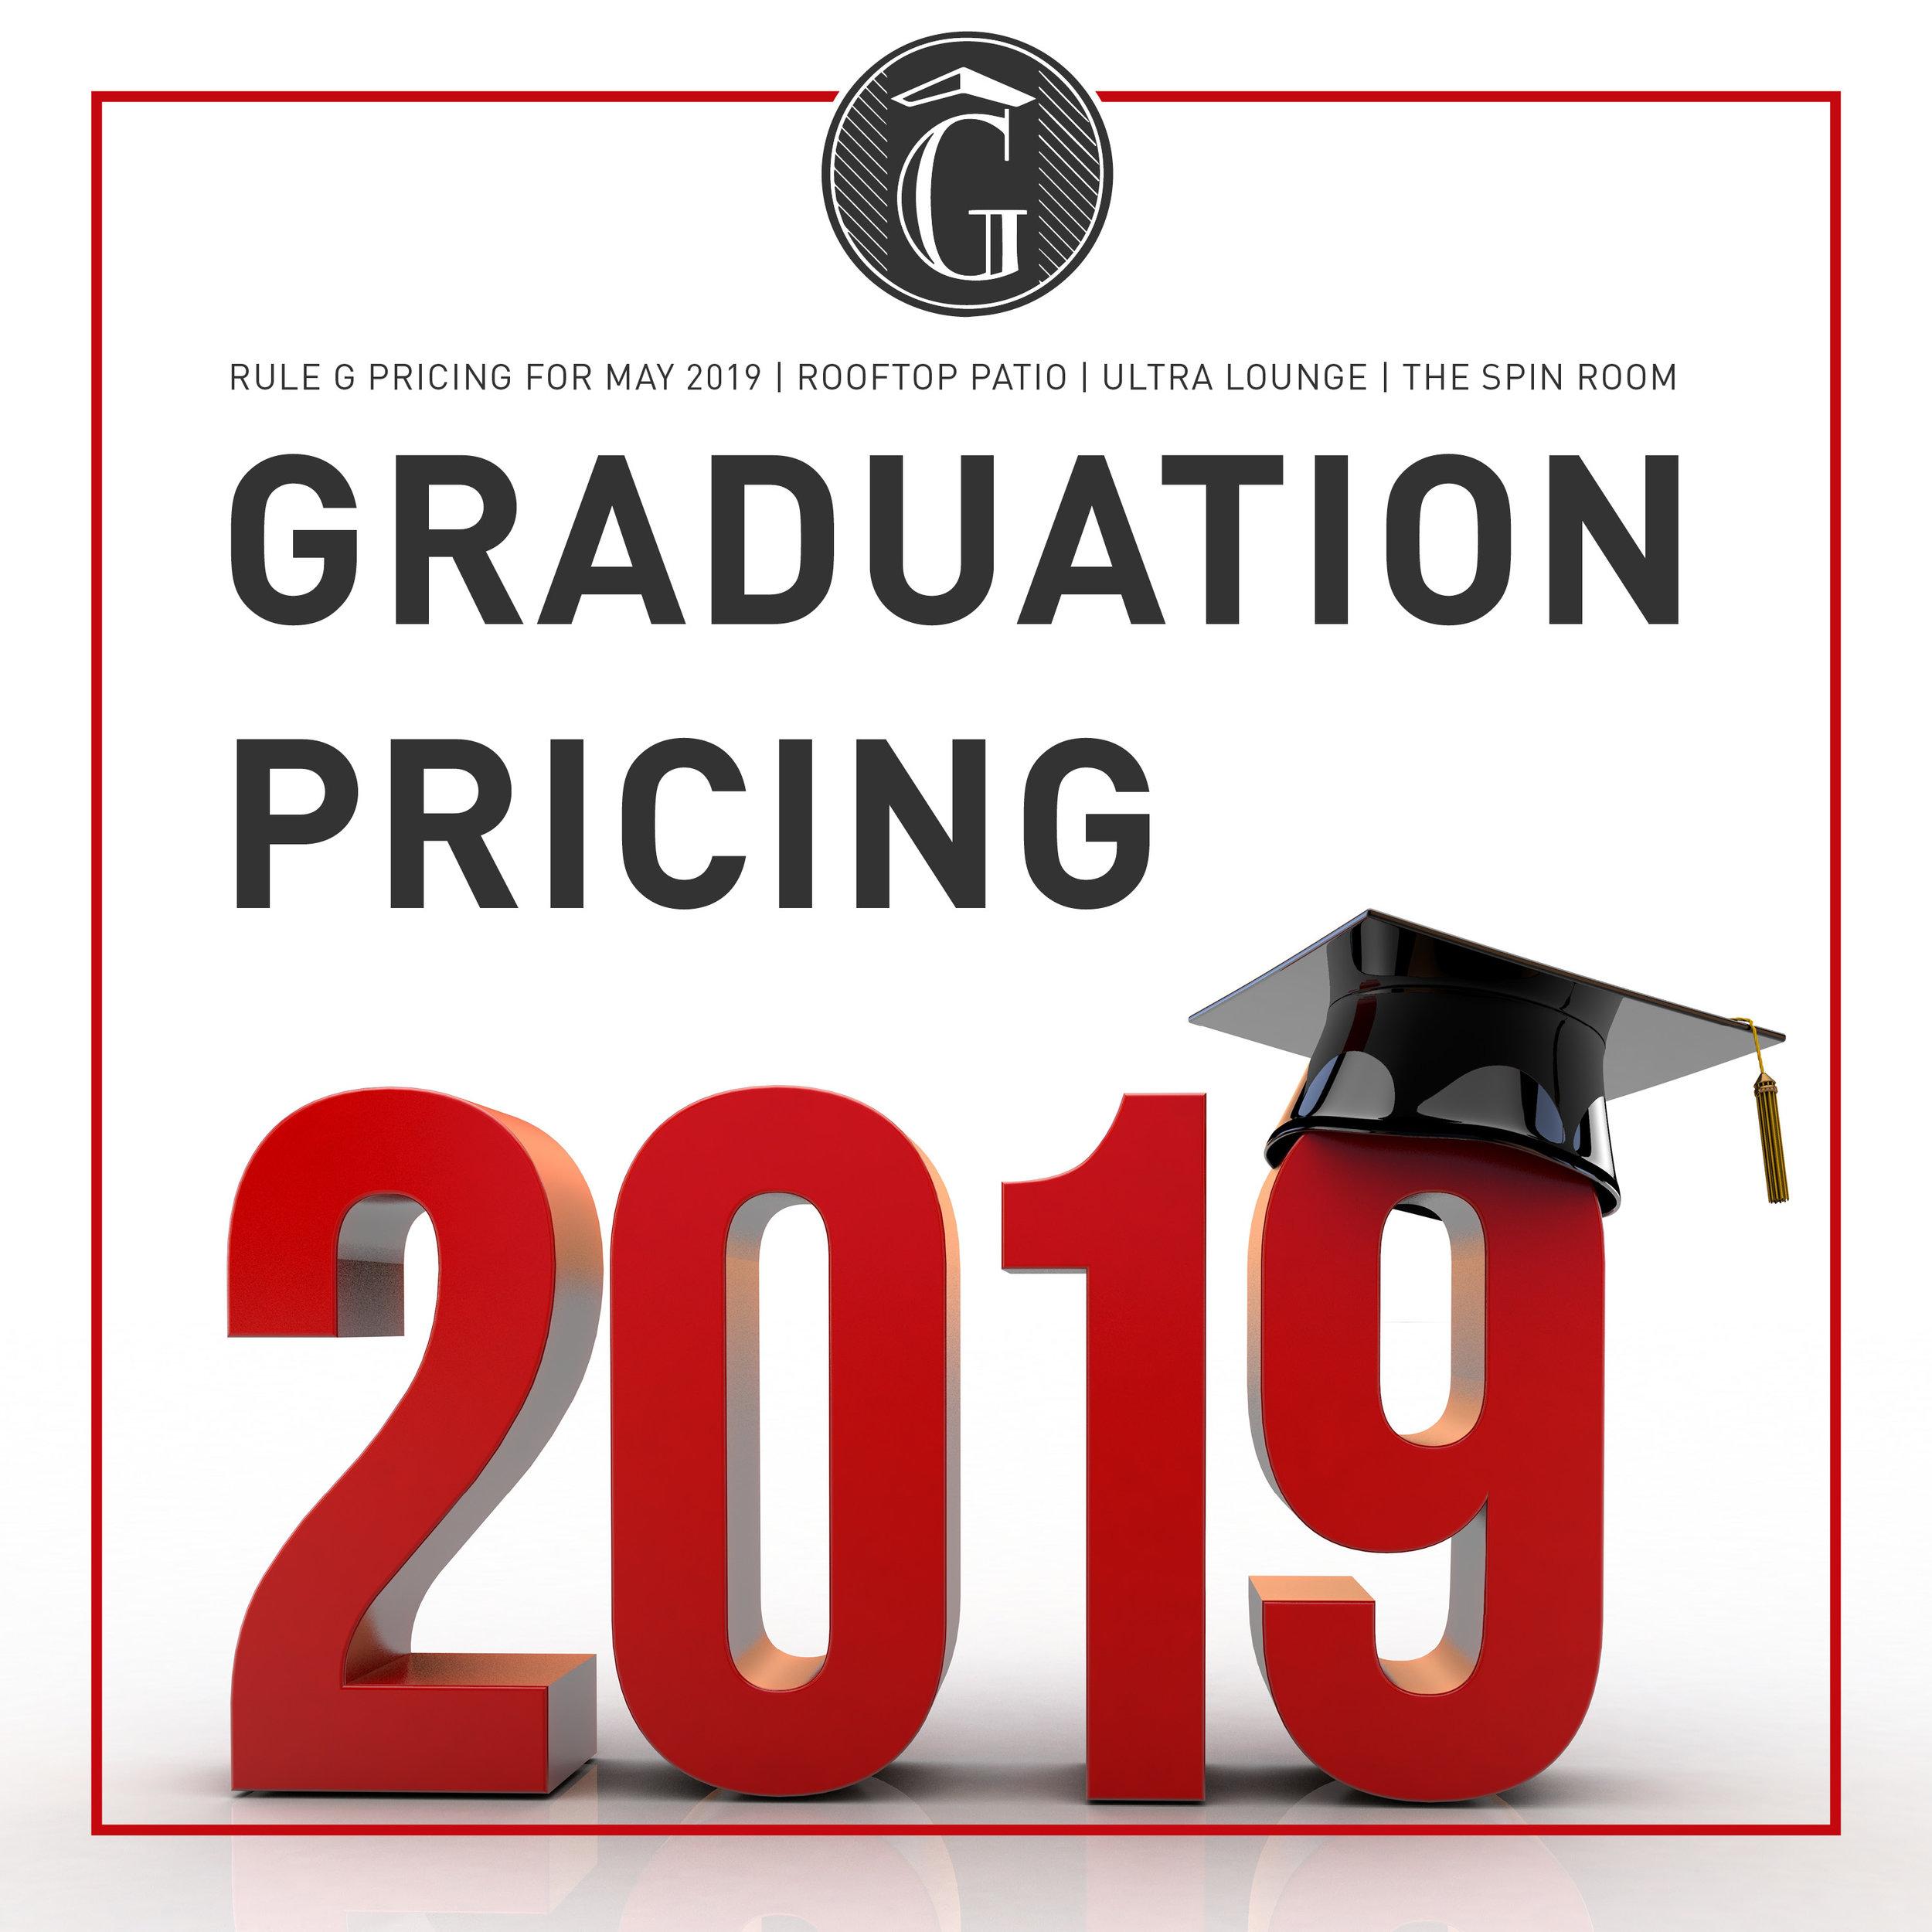 2019 Graduation Pricing.jpg